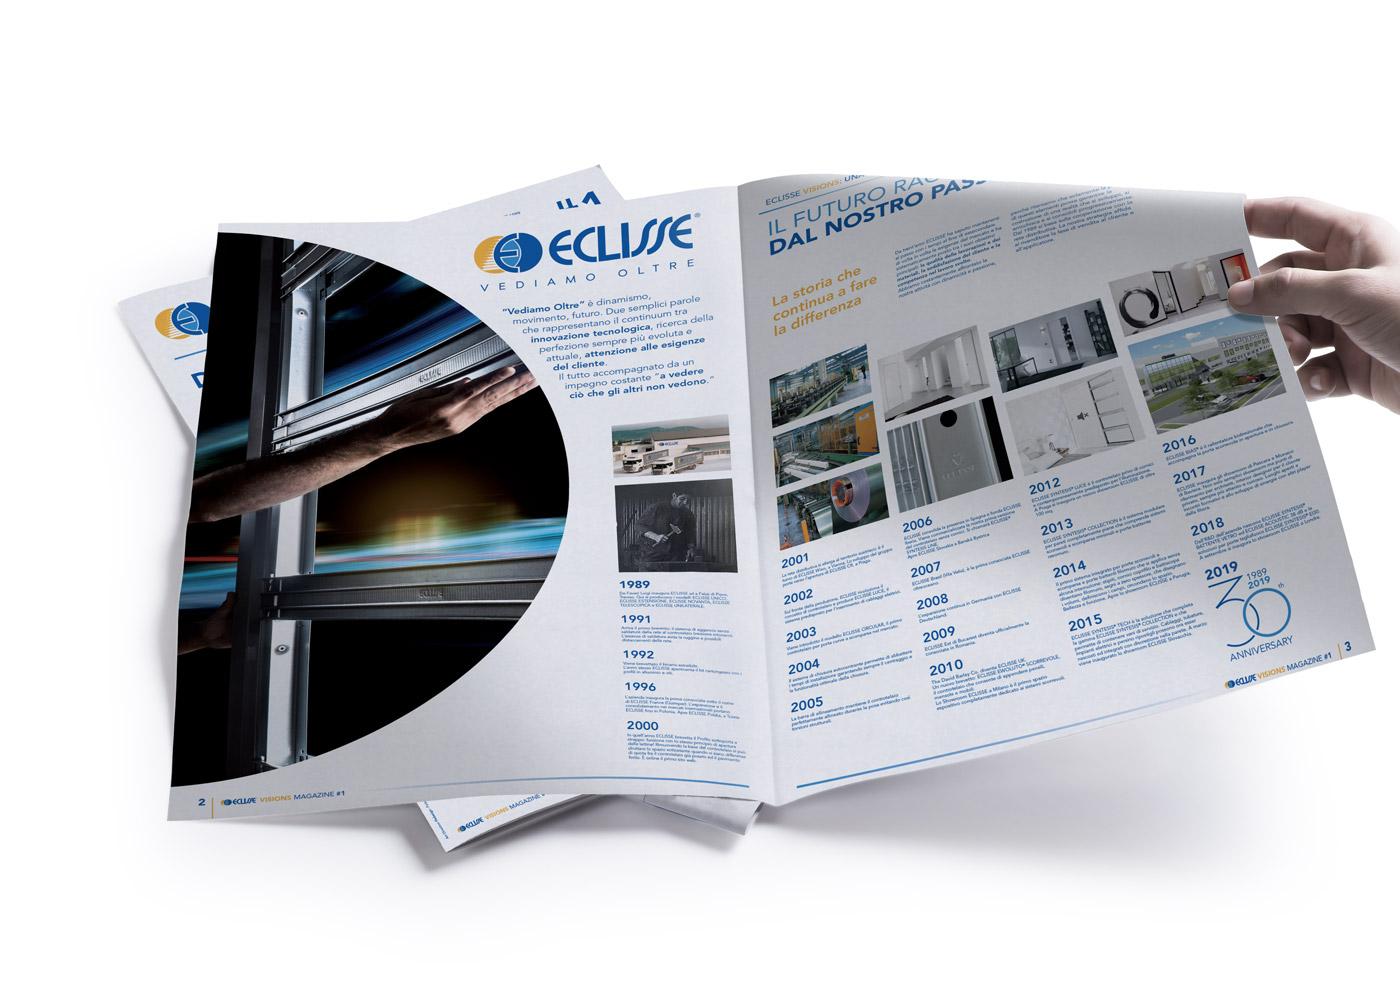 eclisse-magazine1-2